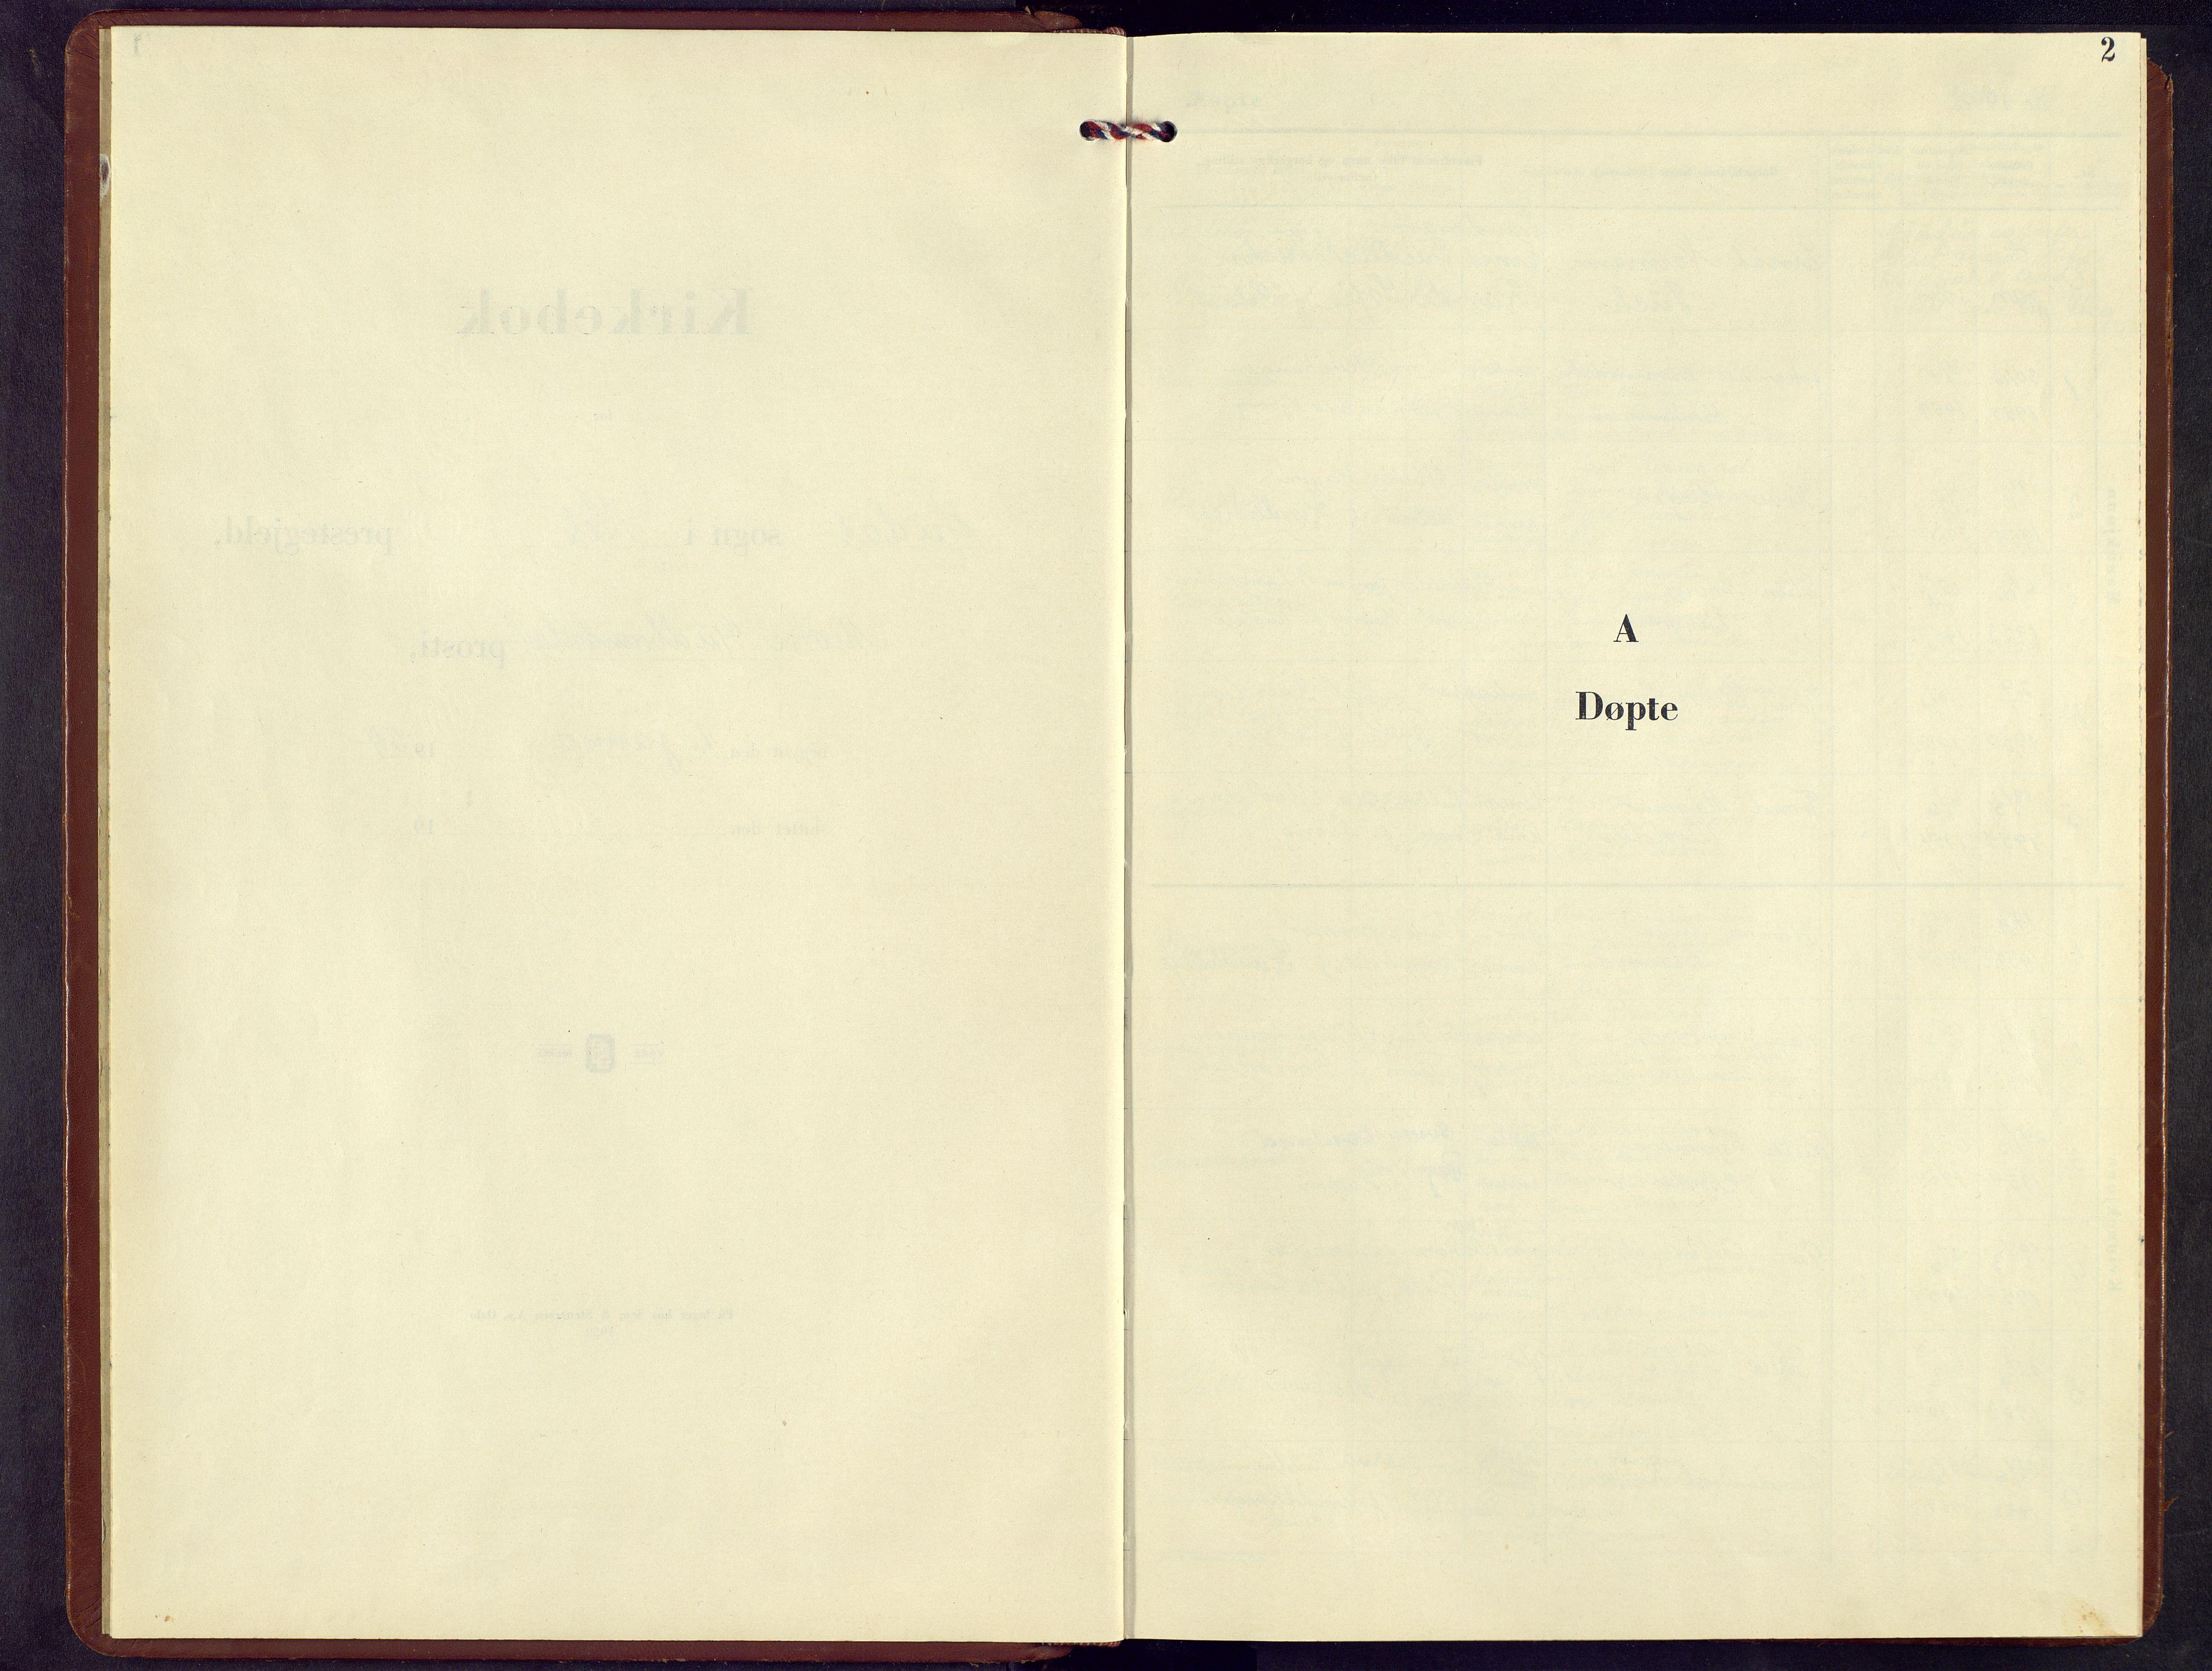 SAH, Sel prestekontor, Klokkerbok nr. 7, 1953-1973, s. 2